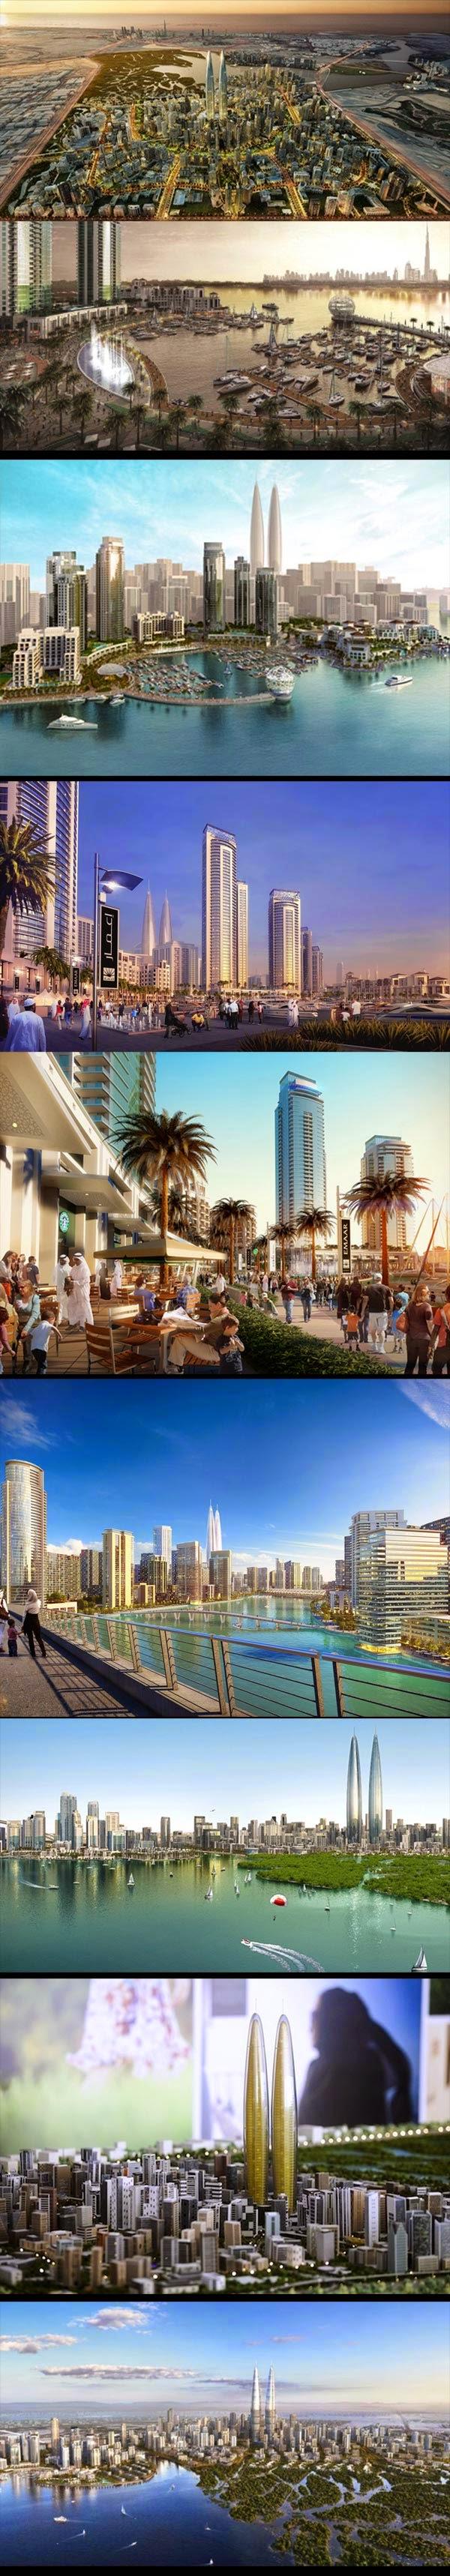 [Image: Dubai%252BCreek%252BHarbour%252B%25281%2529_02.jpg]